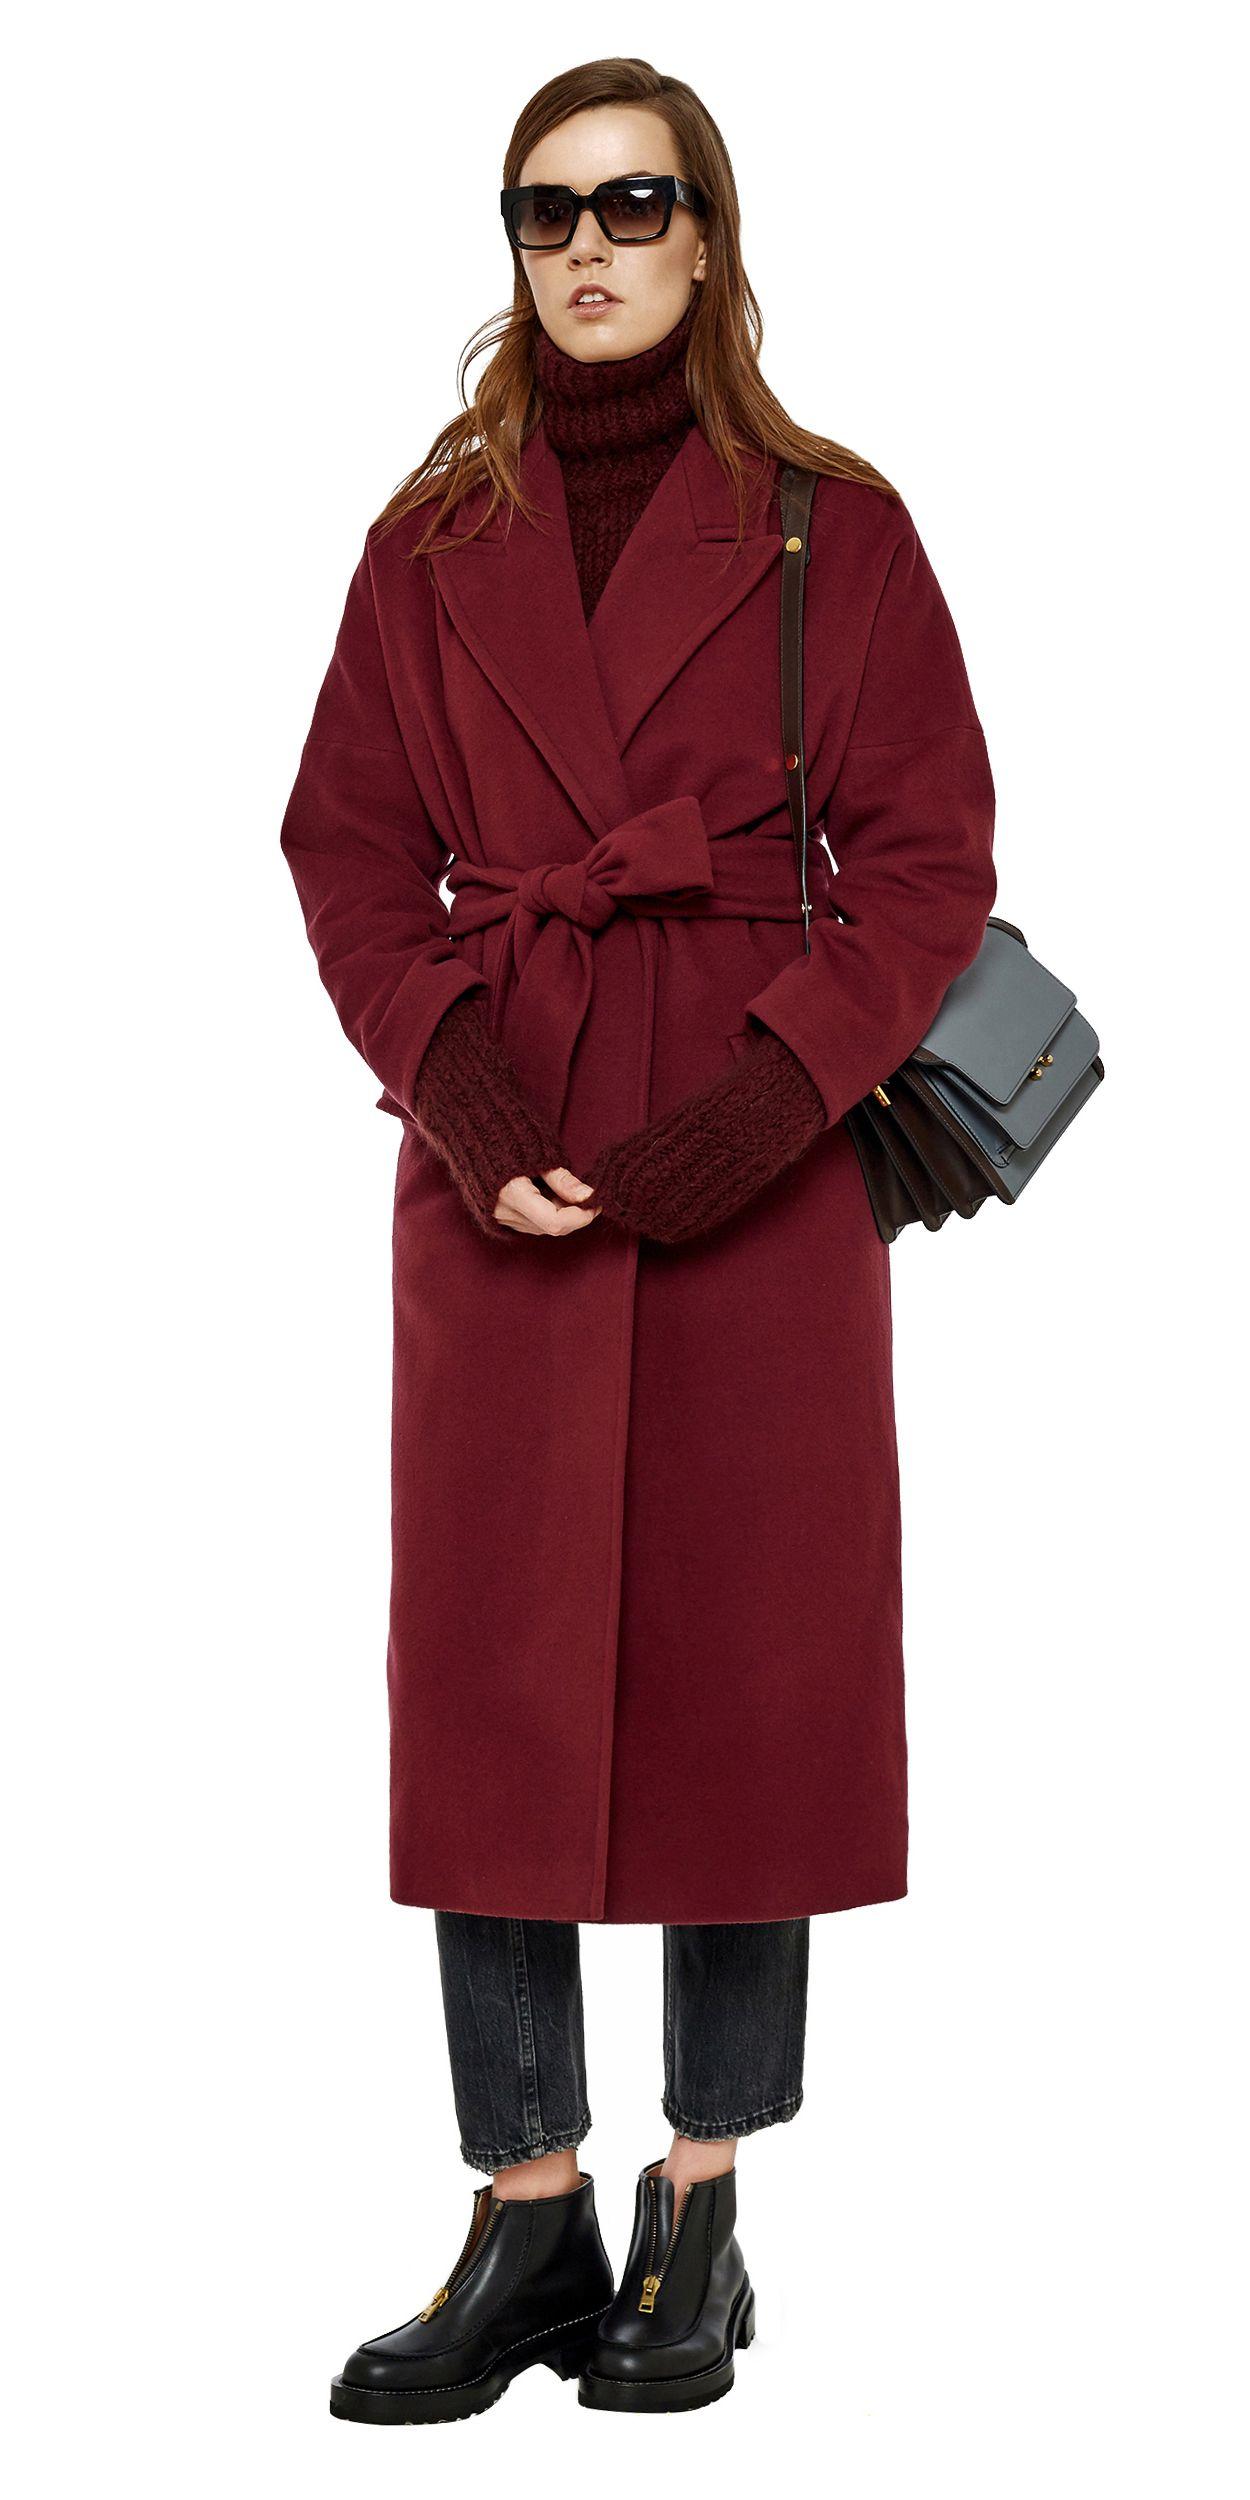 741920f8b130 Пальто-халат   Wish   Pinterest   Coat, Jackets и Burgundy color